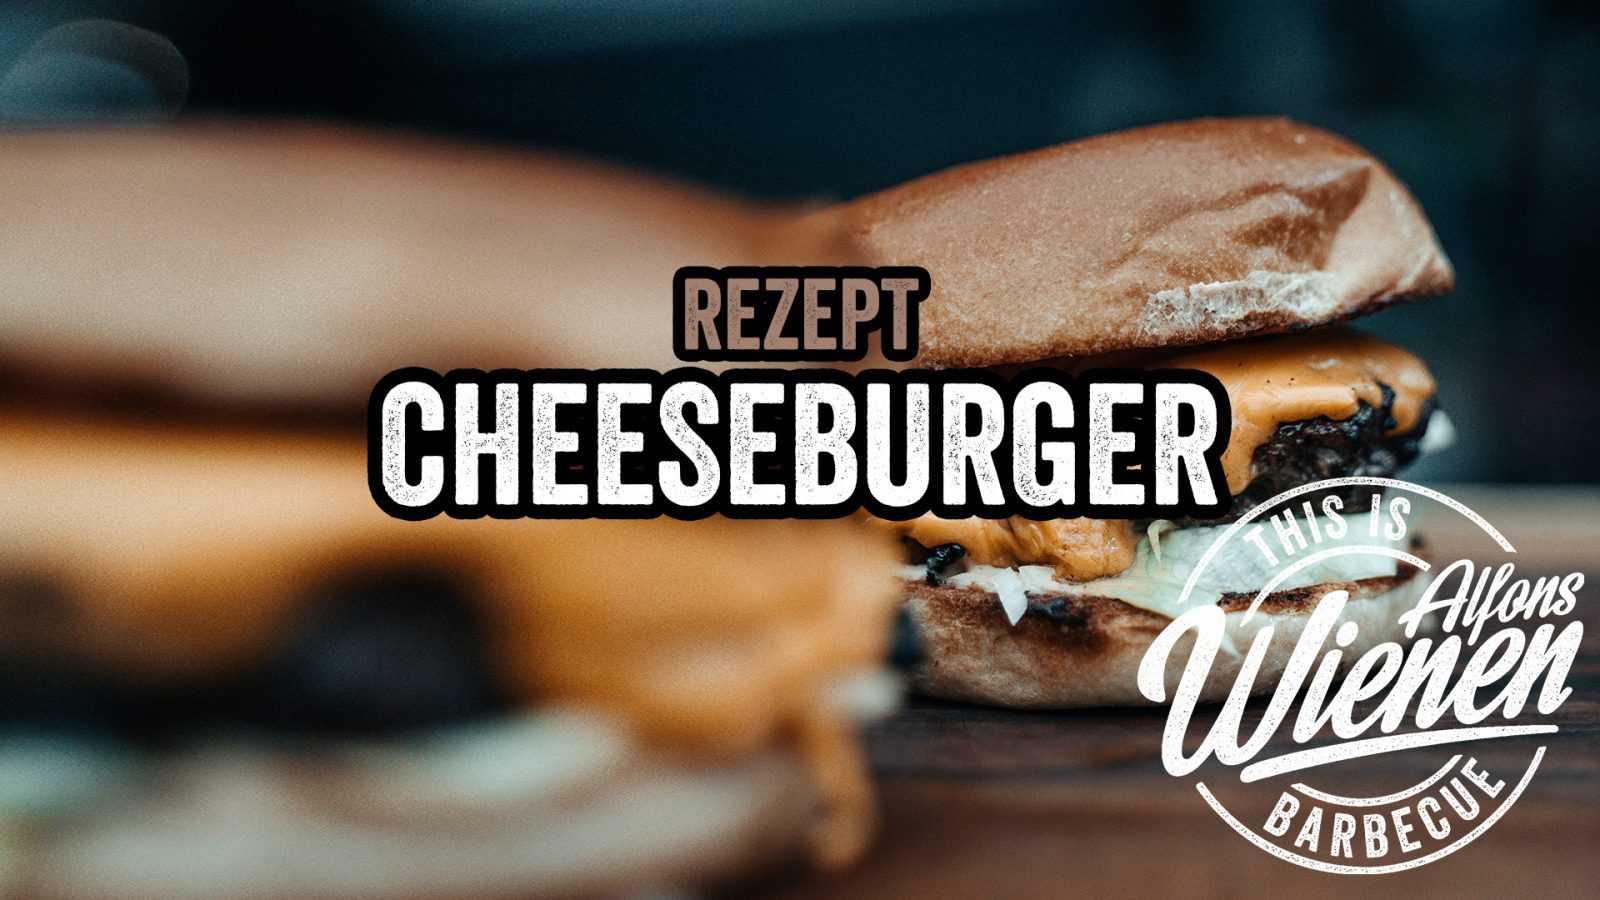 Cheeseburger - Der Klassiker